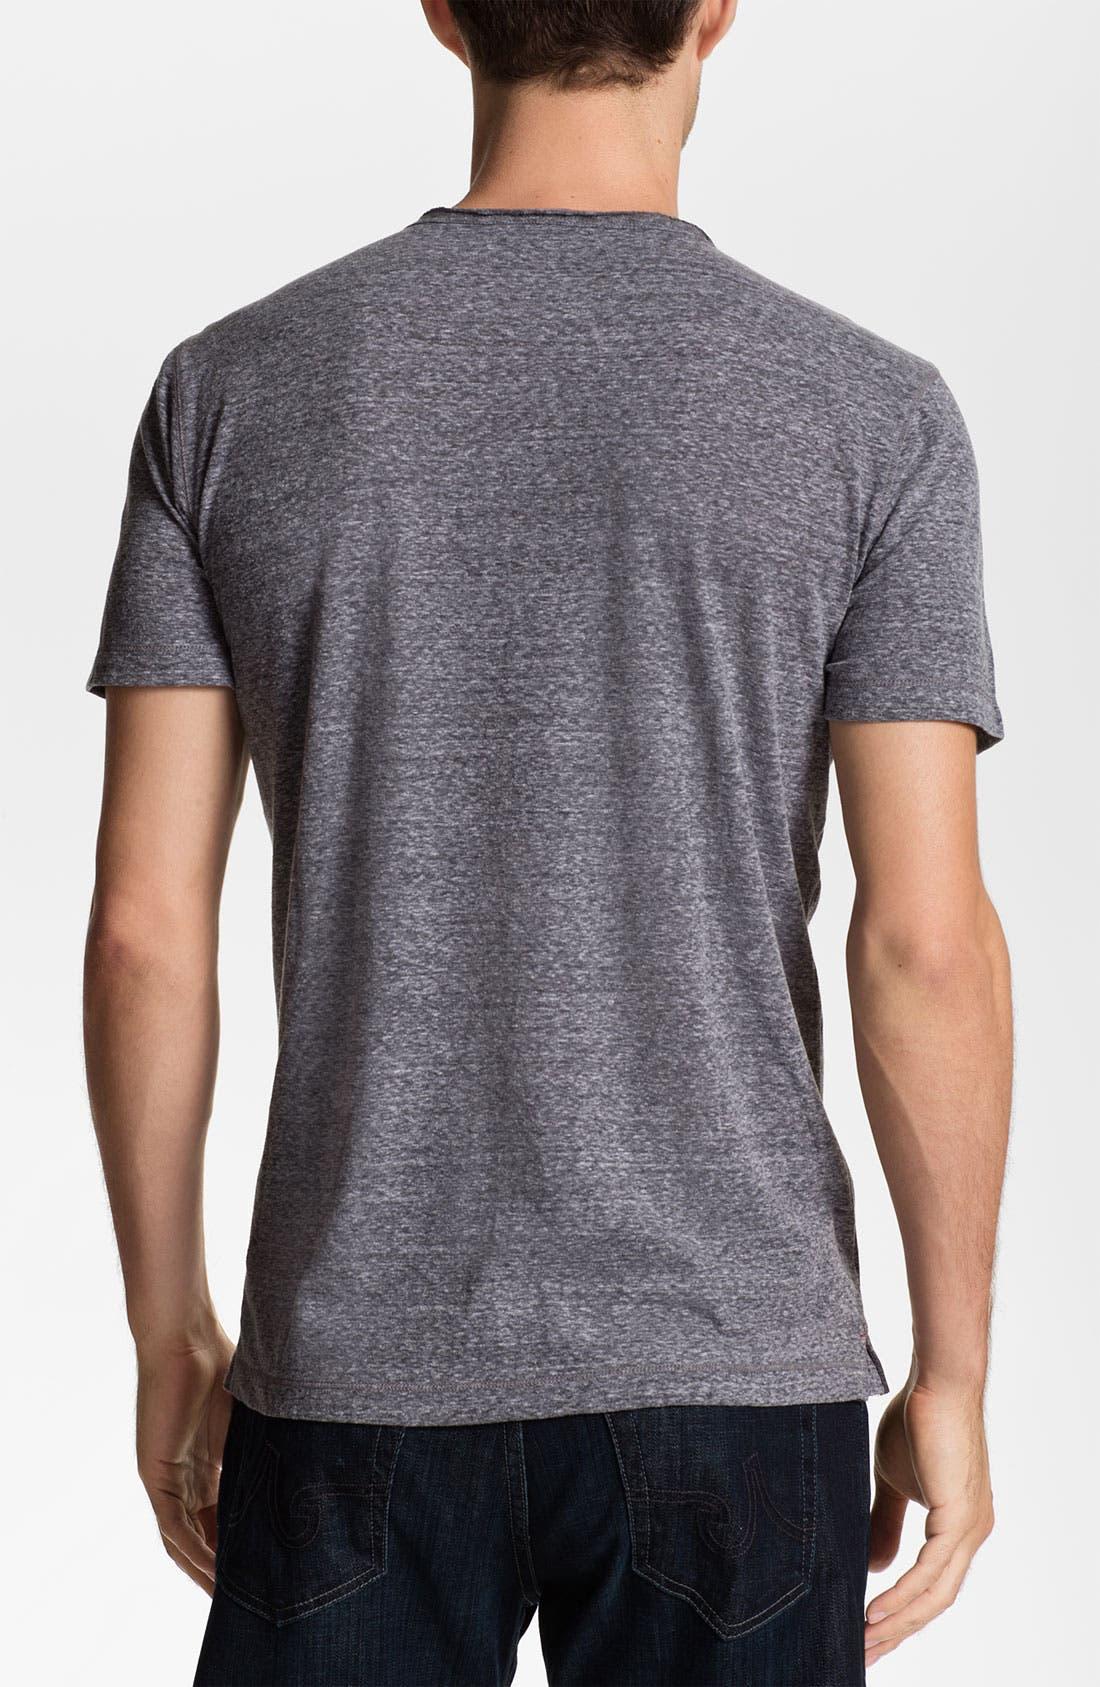 Alternate Image 2  - Daniel Buchler Heathered Cotton Blend V-Neck T-Shirt